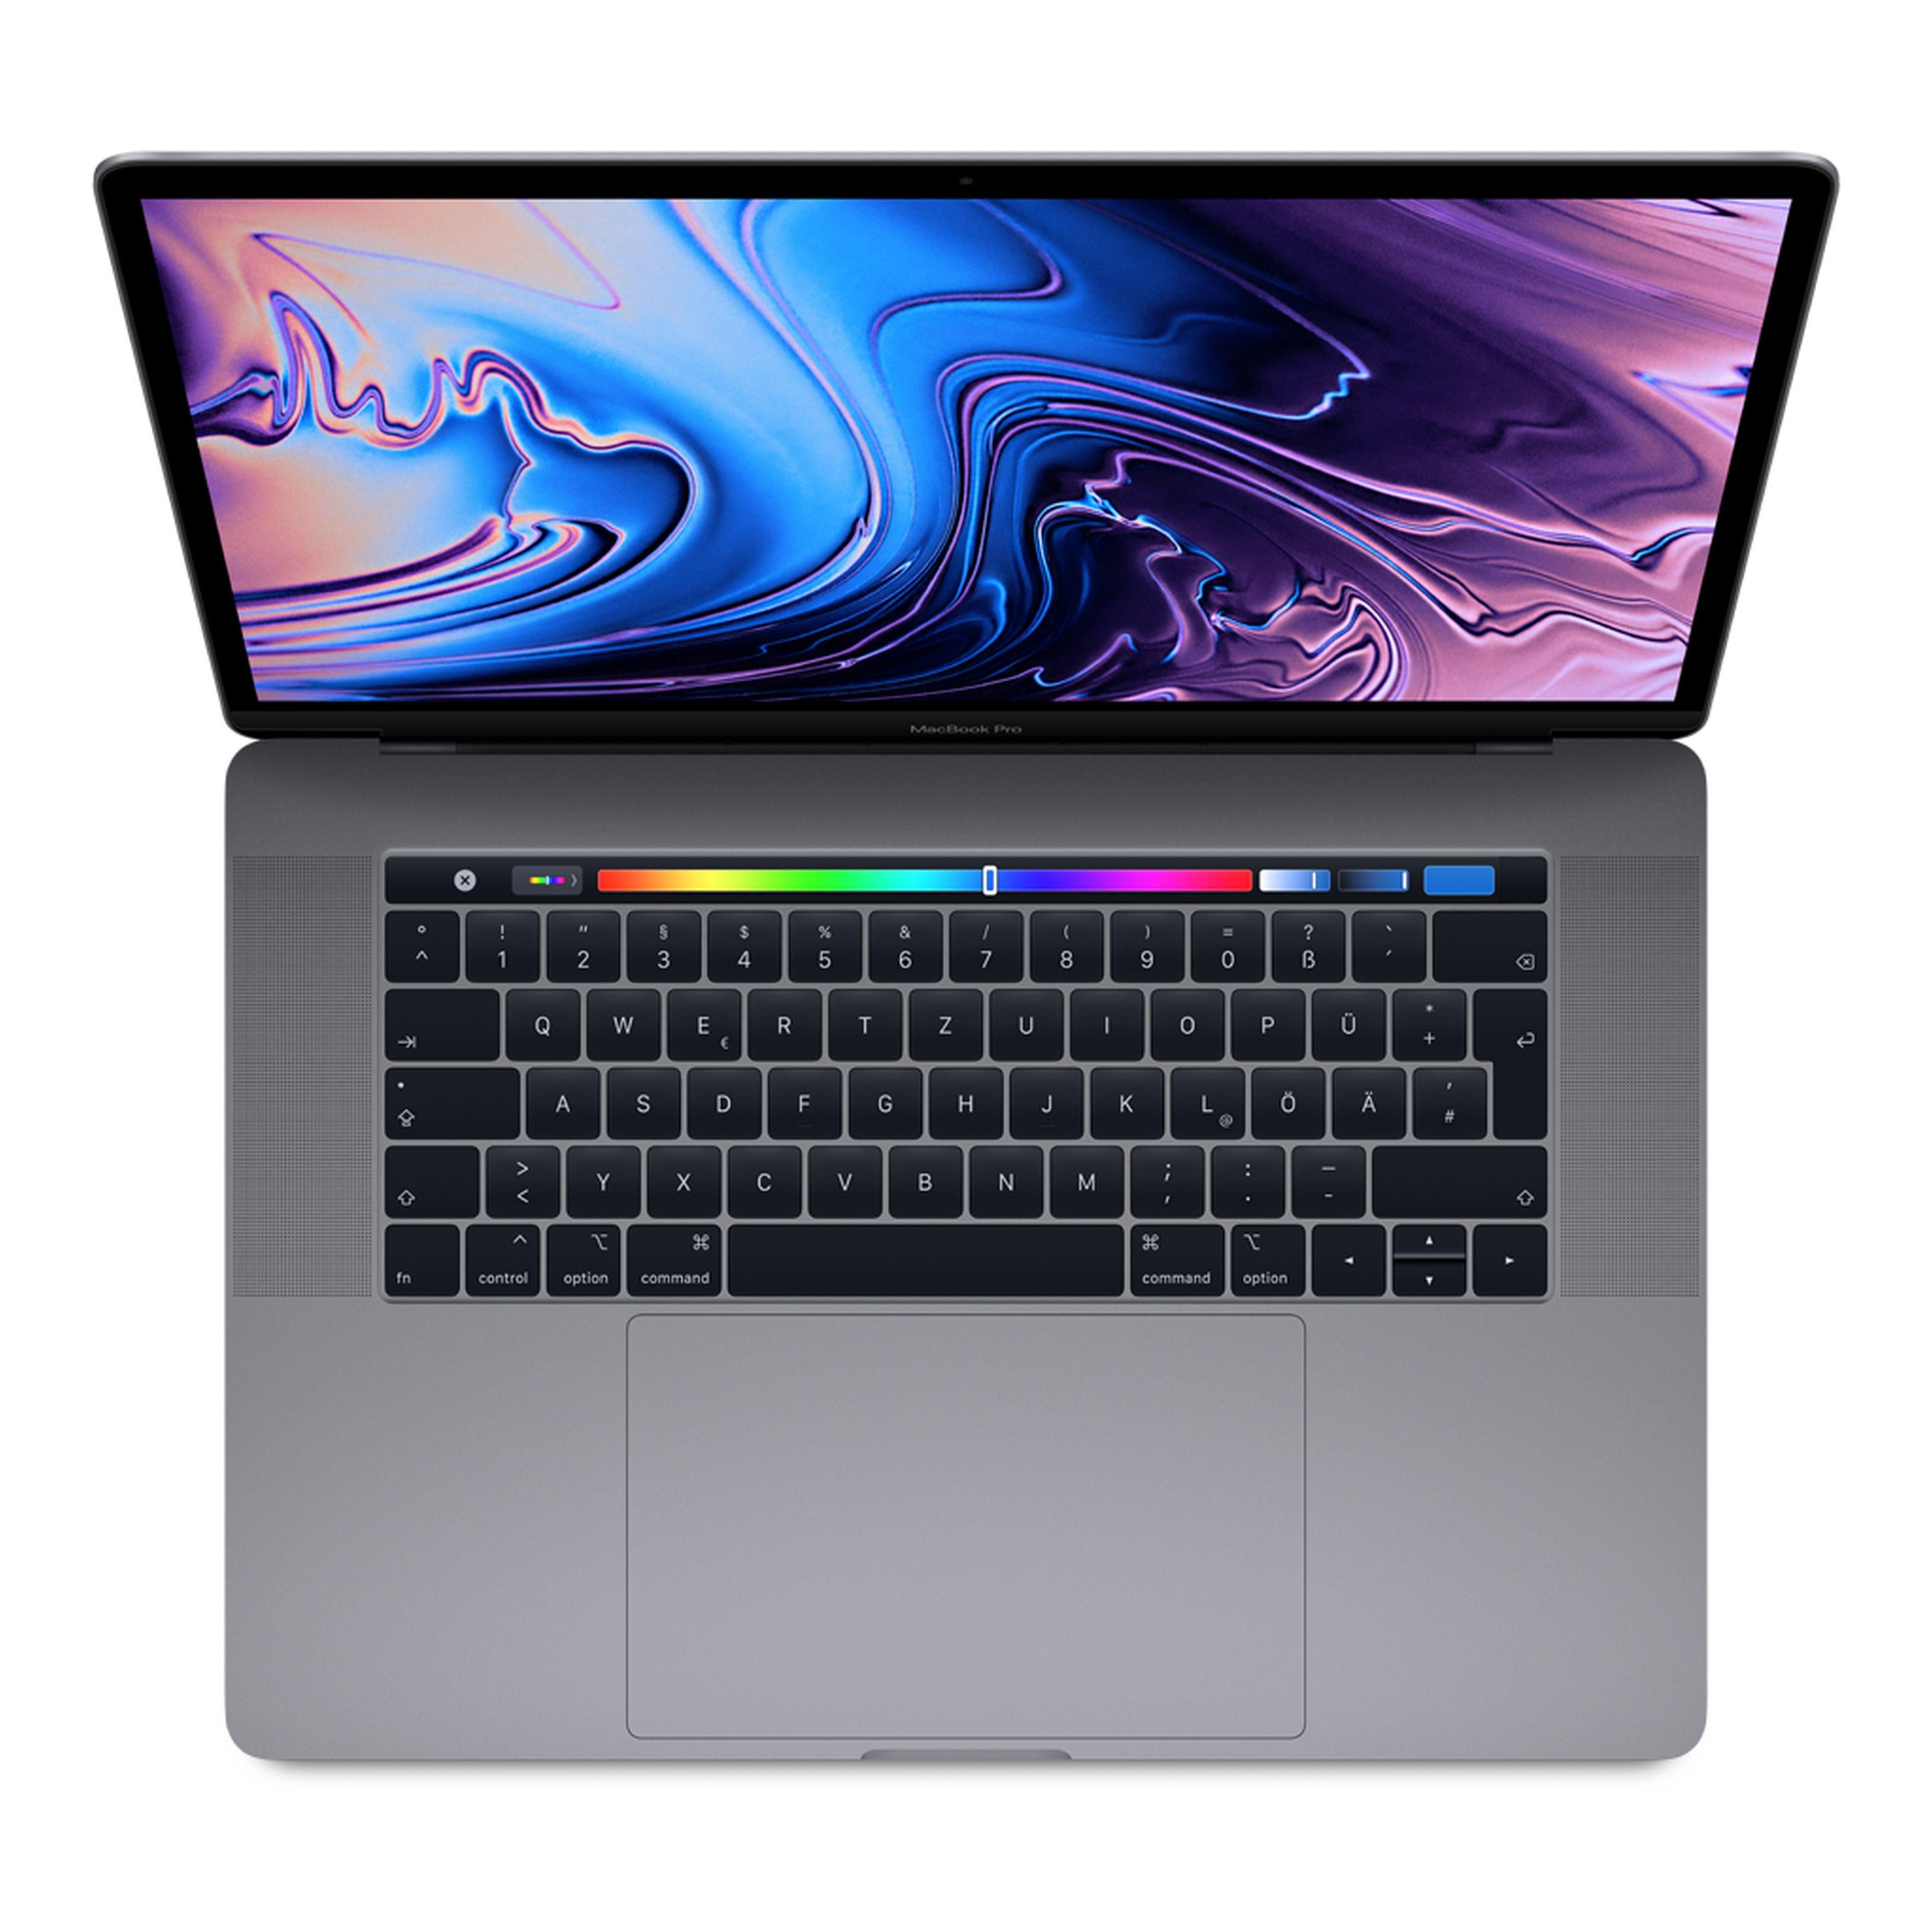 "APPLE MacBook Pro Touch Bar CTO »Intel 6-Core, 39,11 cm (15,4""), 256 GB SSD«"